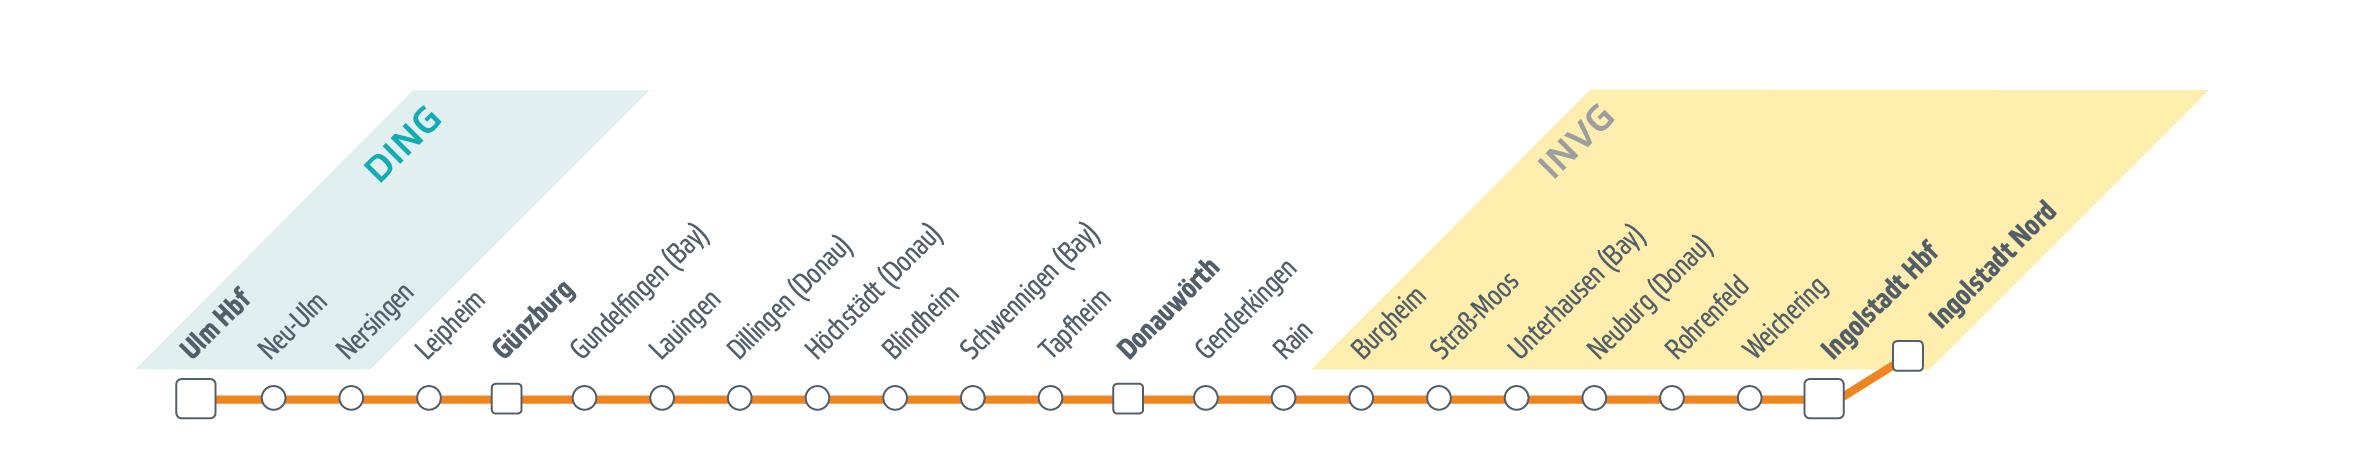 Agilis Fahrplan Regensburg